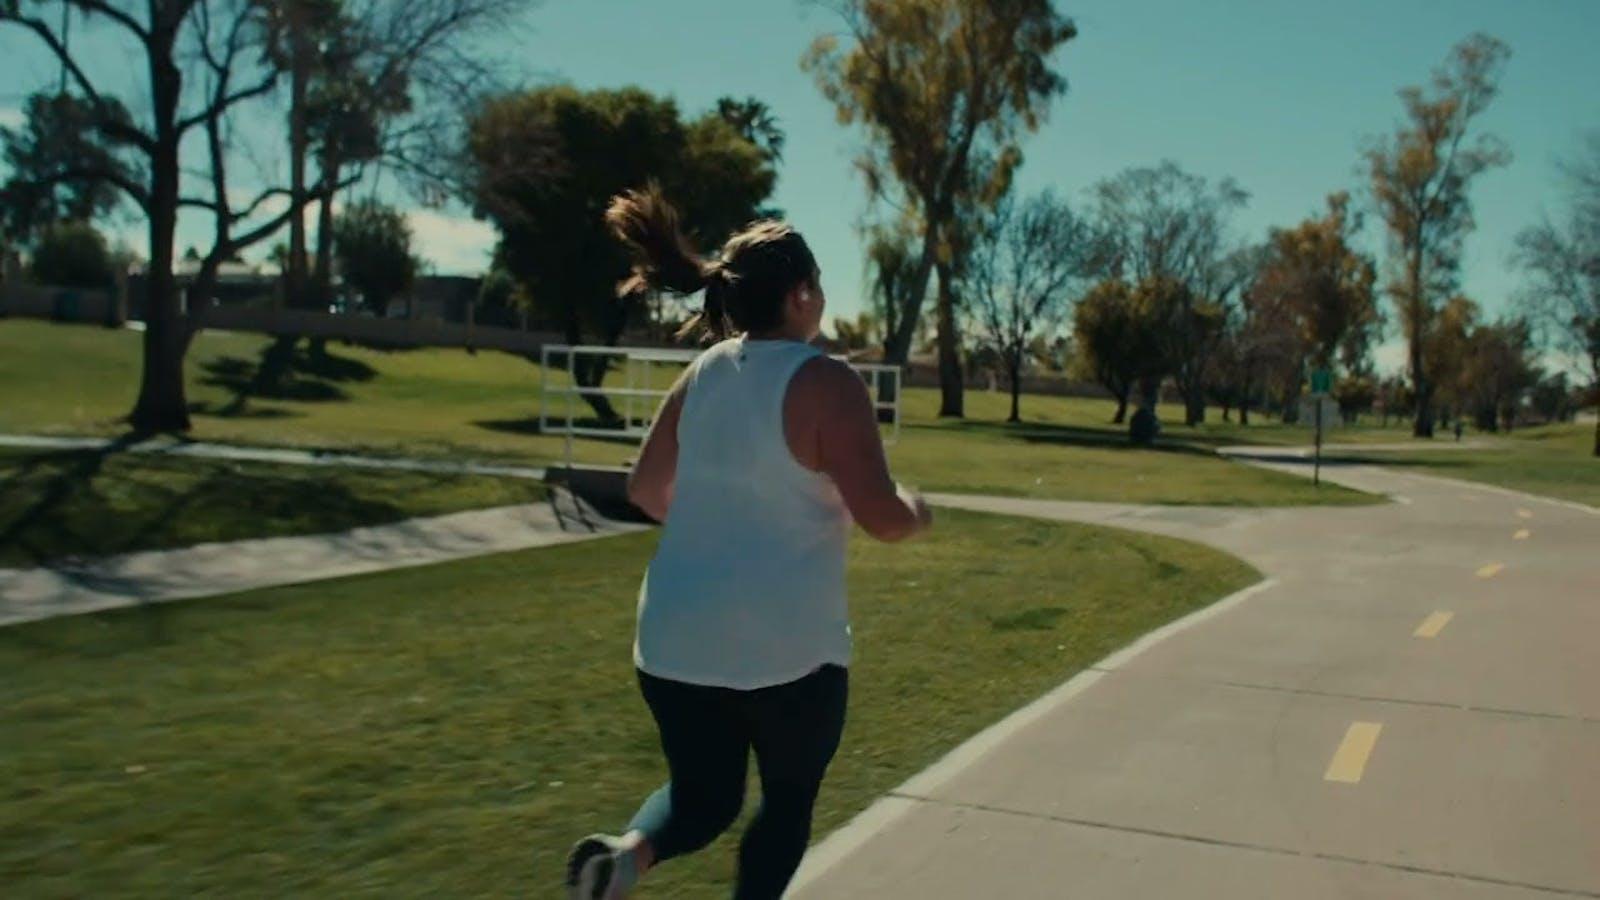 Woman in white tank top running down empty street